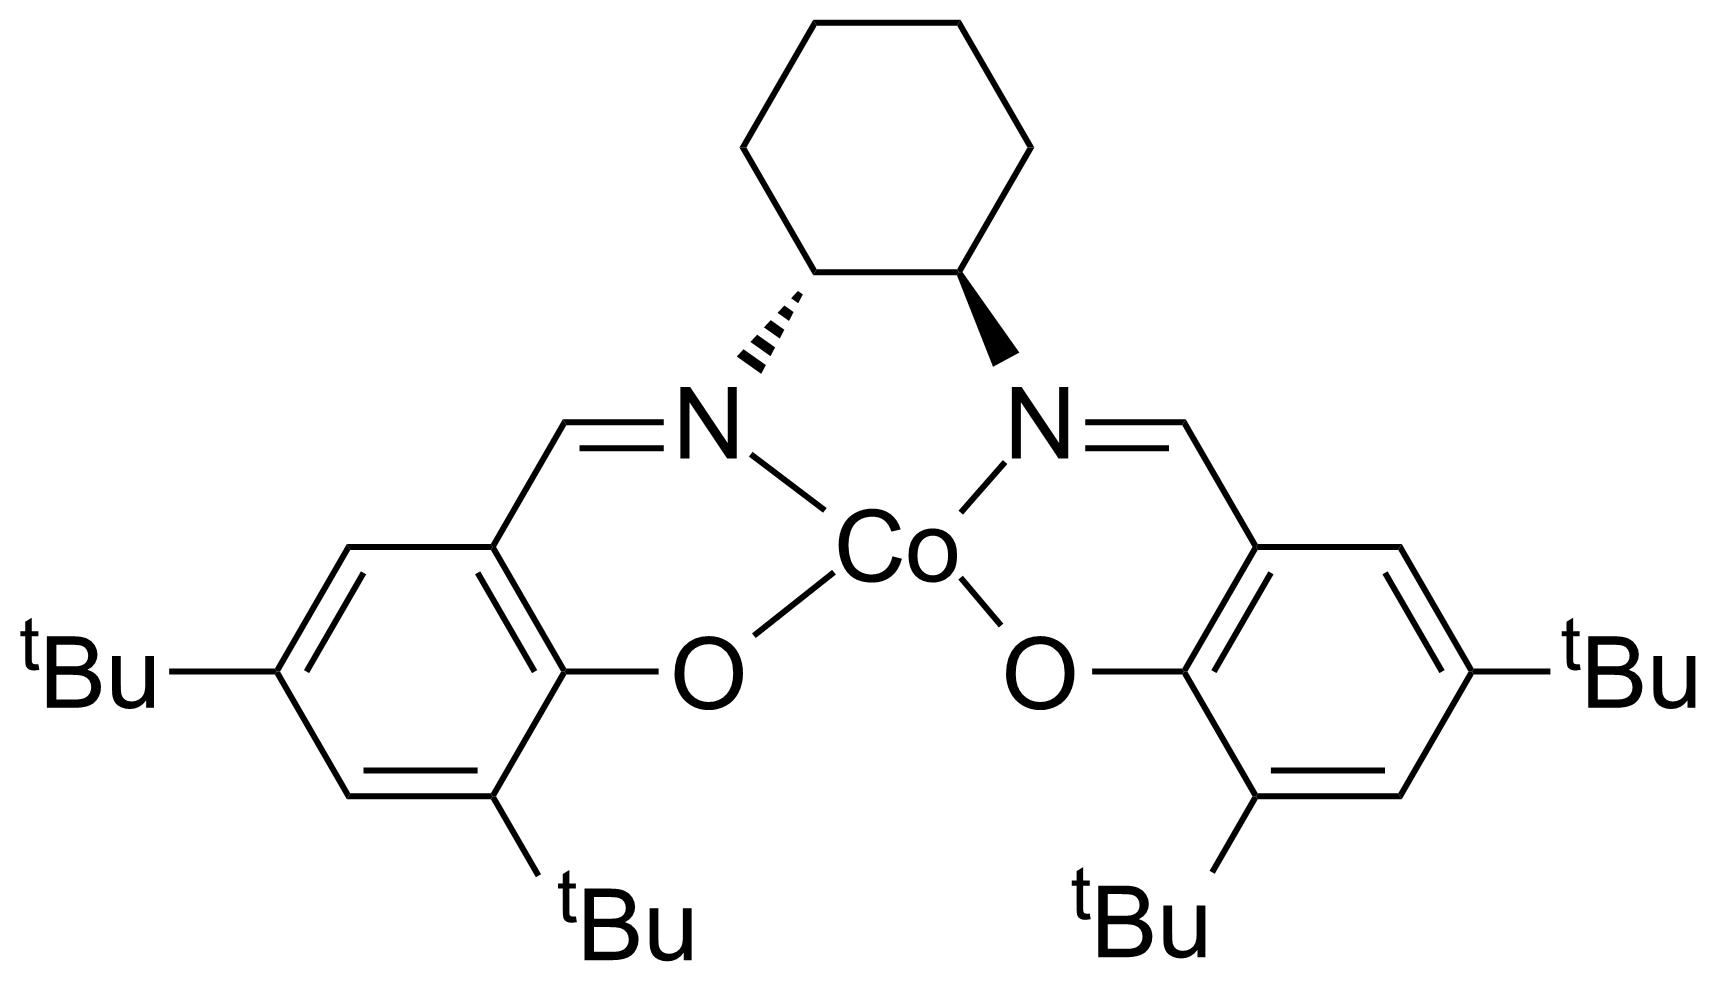 Structure of (R,R)-(-)-N,N'-Bis(3,5-di-tert-butylsalicylidene)-1,2-cyclohexanediaminocobalt(II)